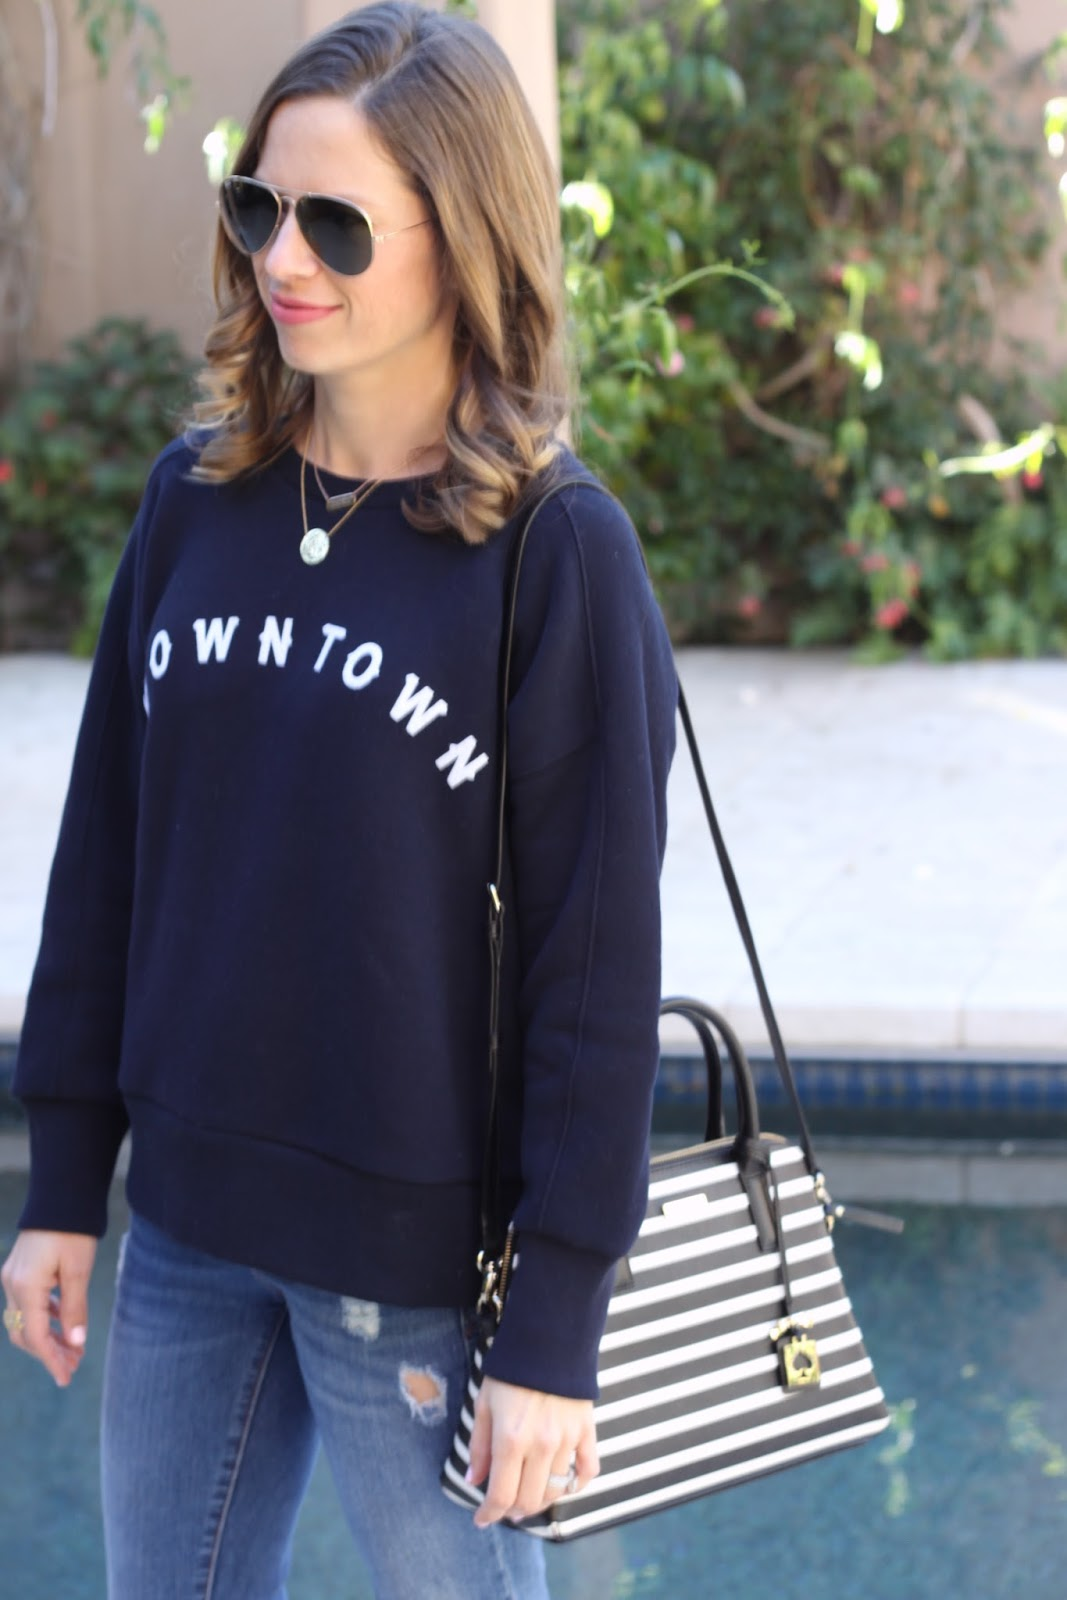 downtown sweatshirt